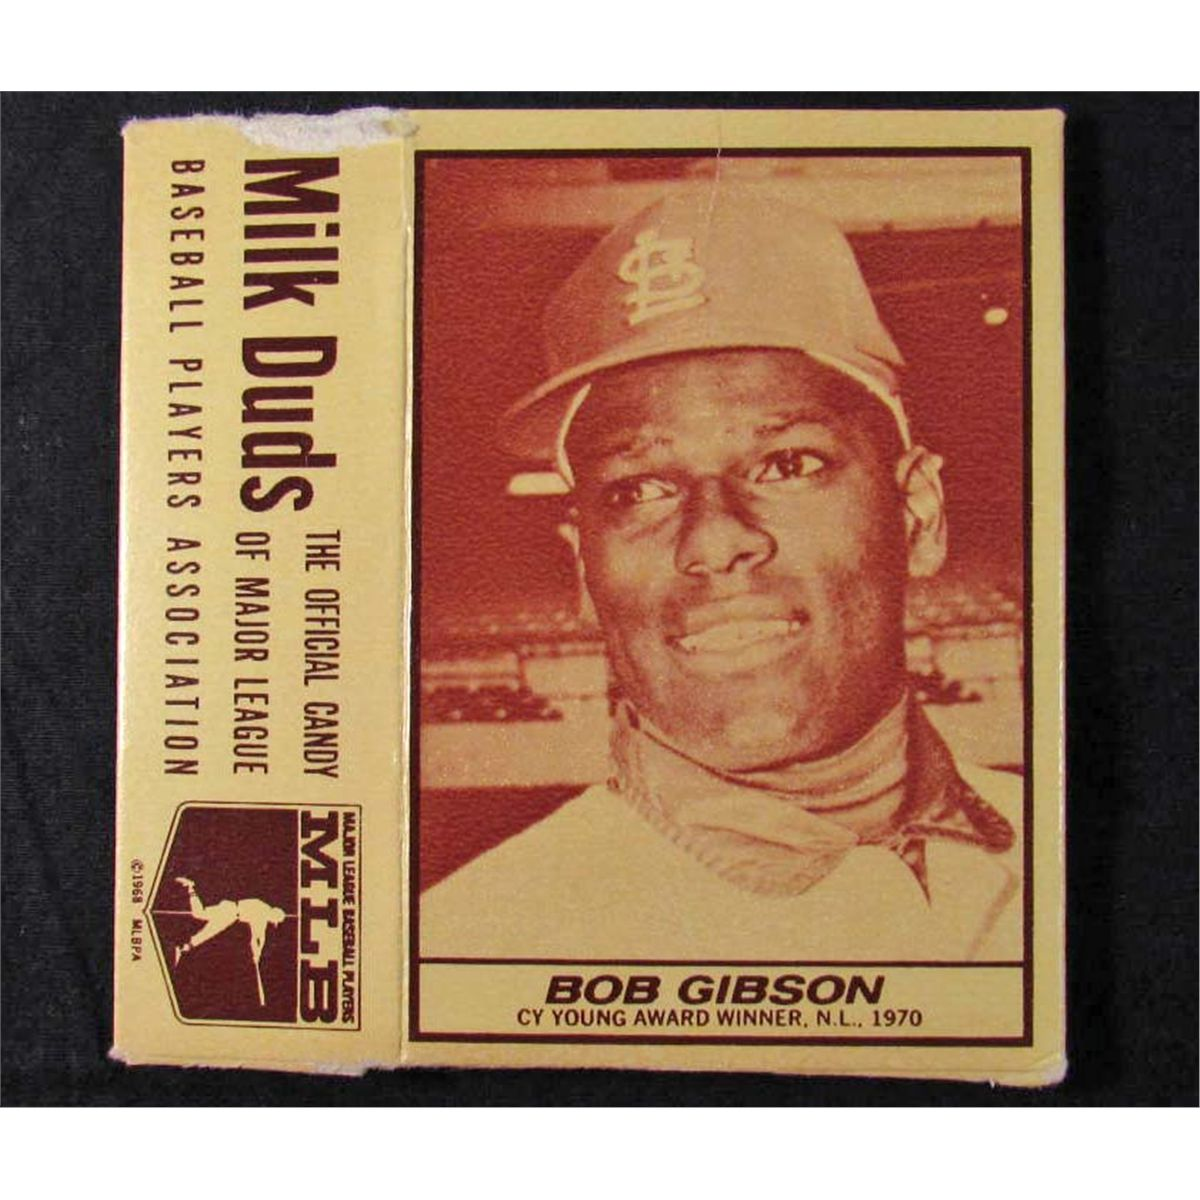 1971 Milk Duds Bob Gibson